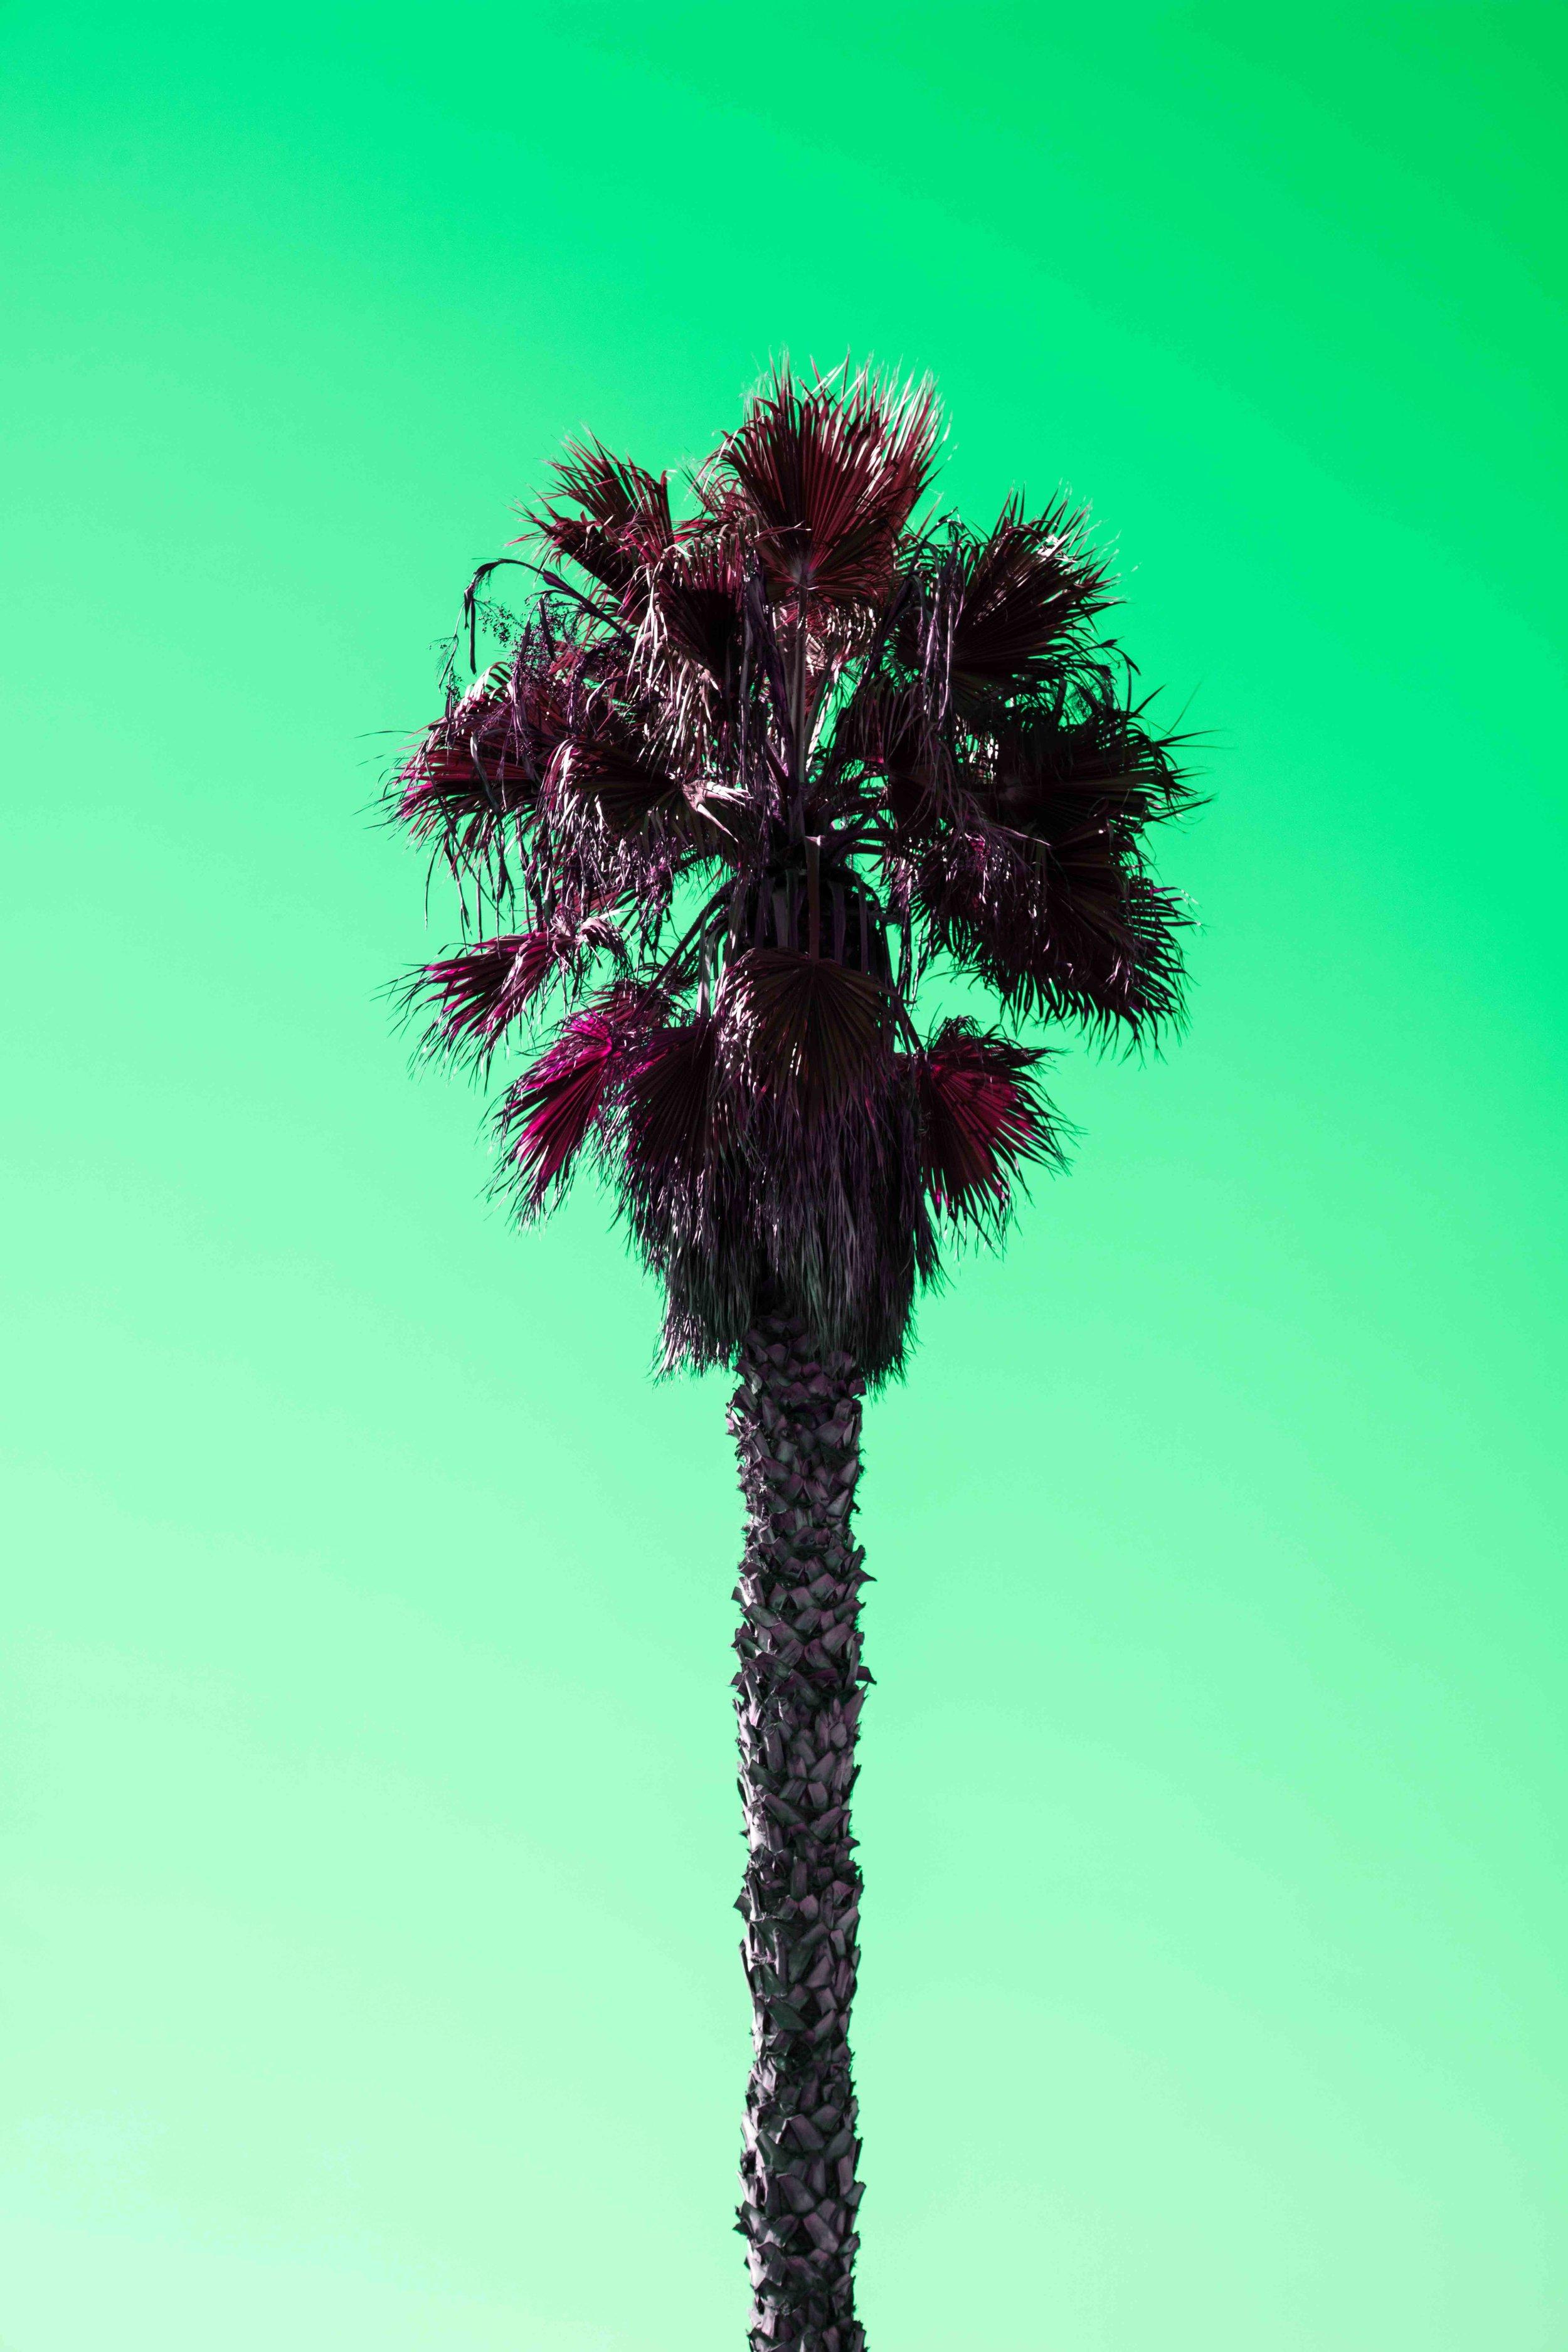 PALM_TREES-5851_V2.jpg